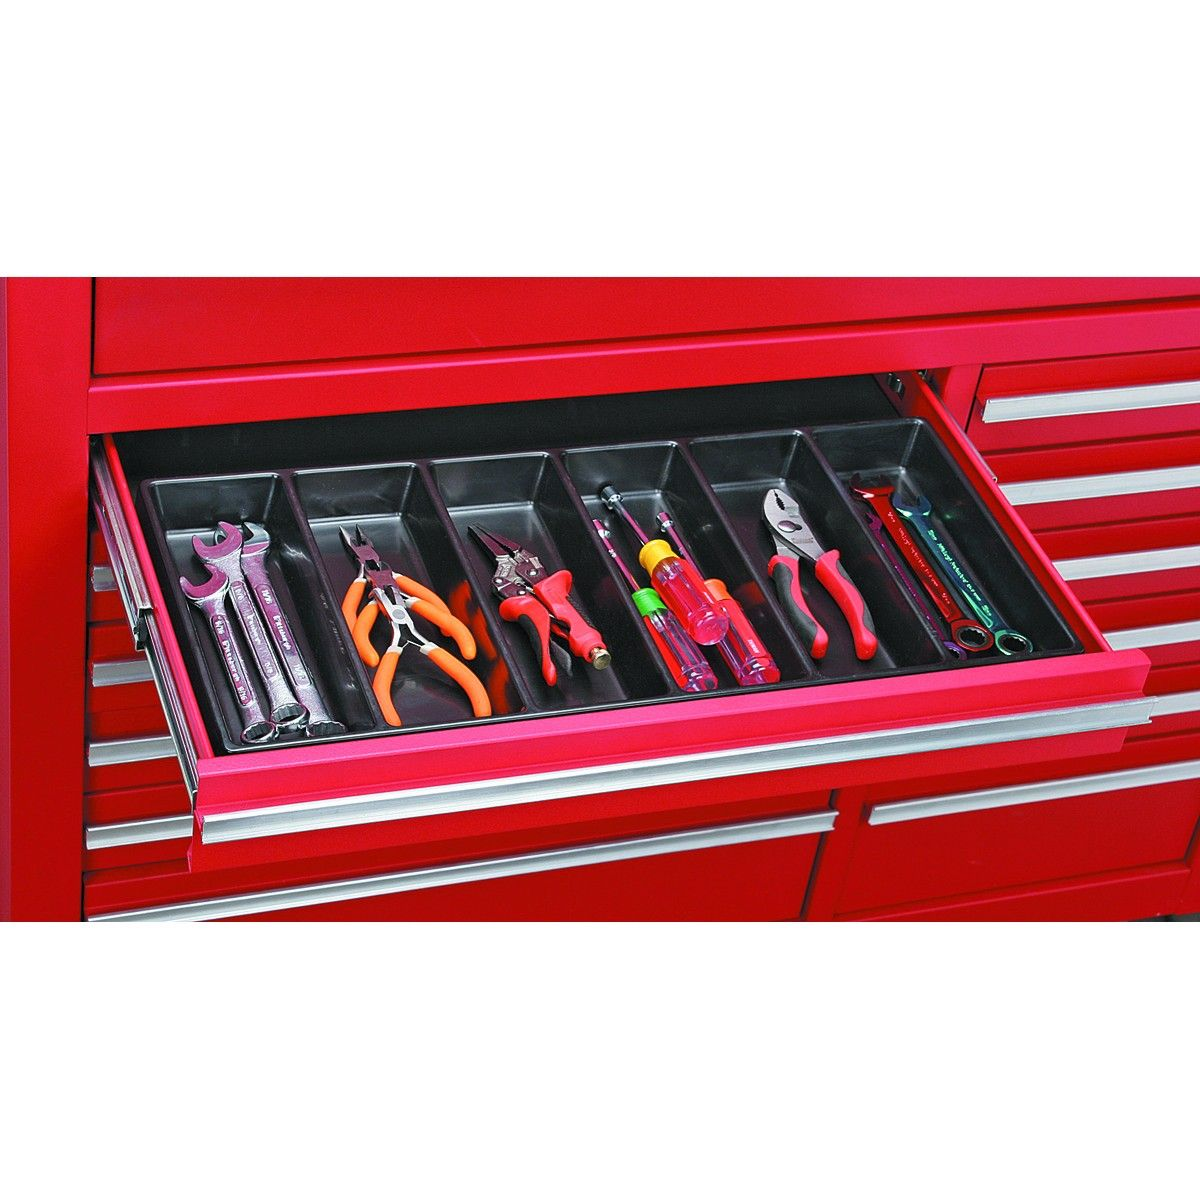 6 Compartment Drawer Organizer Tool Chest Organization Drawer